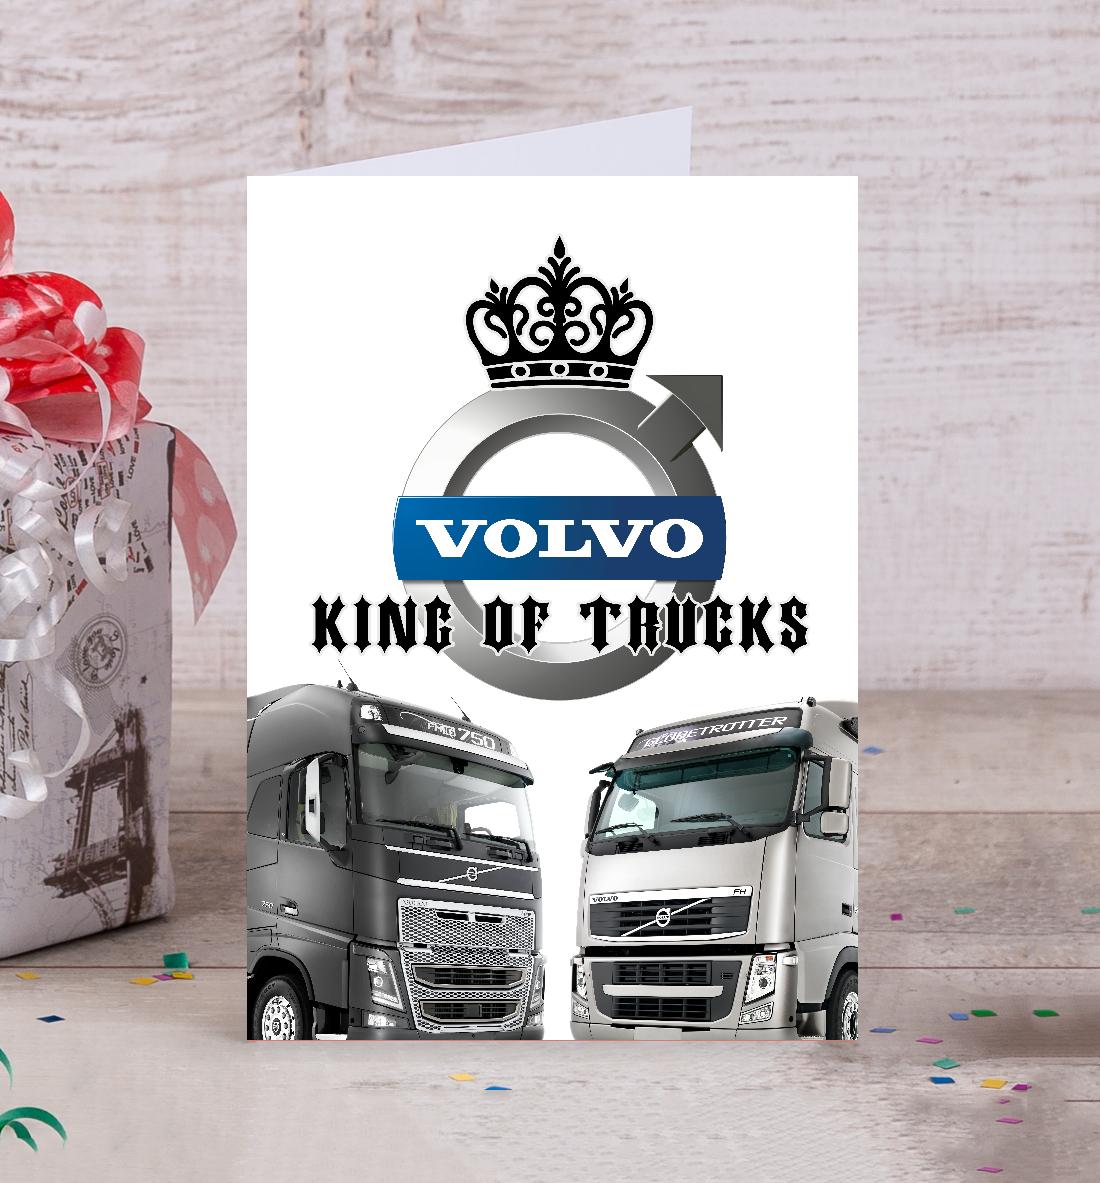 Купить VOLVO - король грузовиков, Printbar, Открытки, GRZ-894611-otk